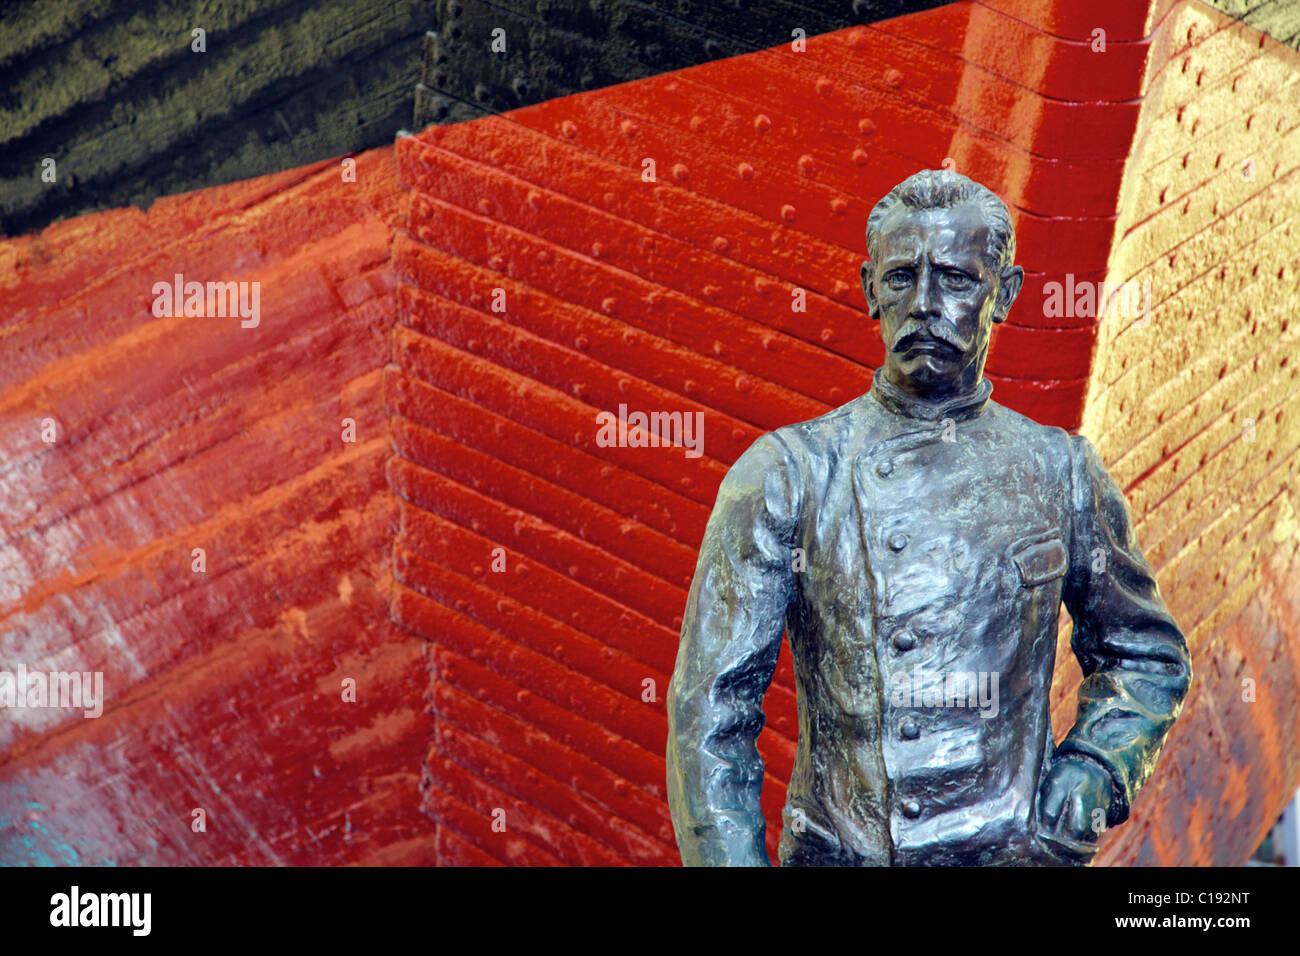 Roald Amundsen bronze statue in front of polar expedition vessel, Fram, Frammuseet Museum, Bygdoy, Oslo, Norway, Stock Photo